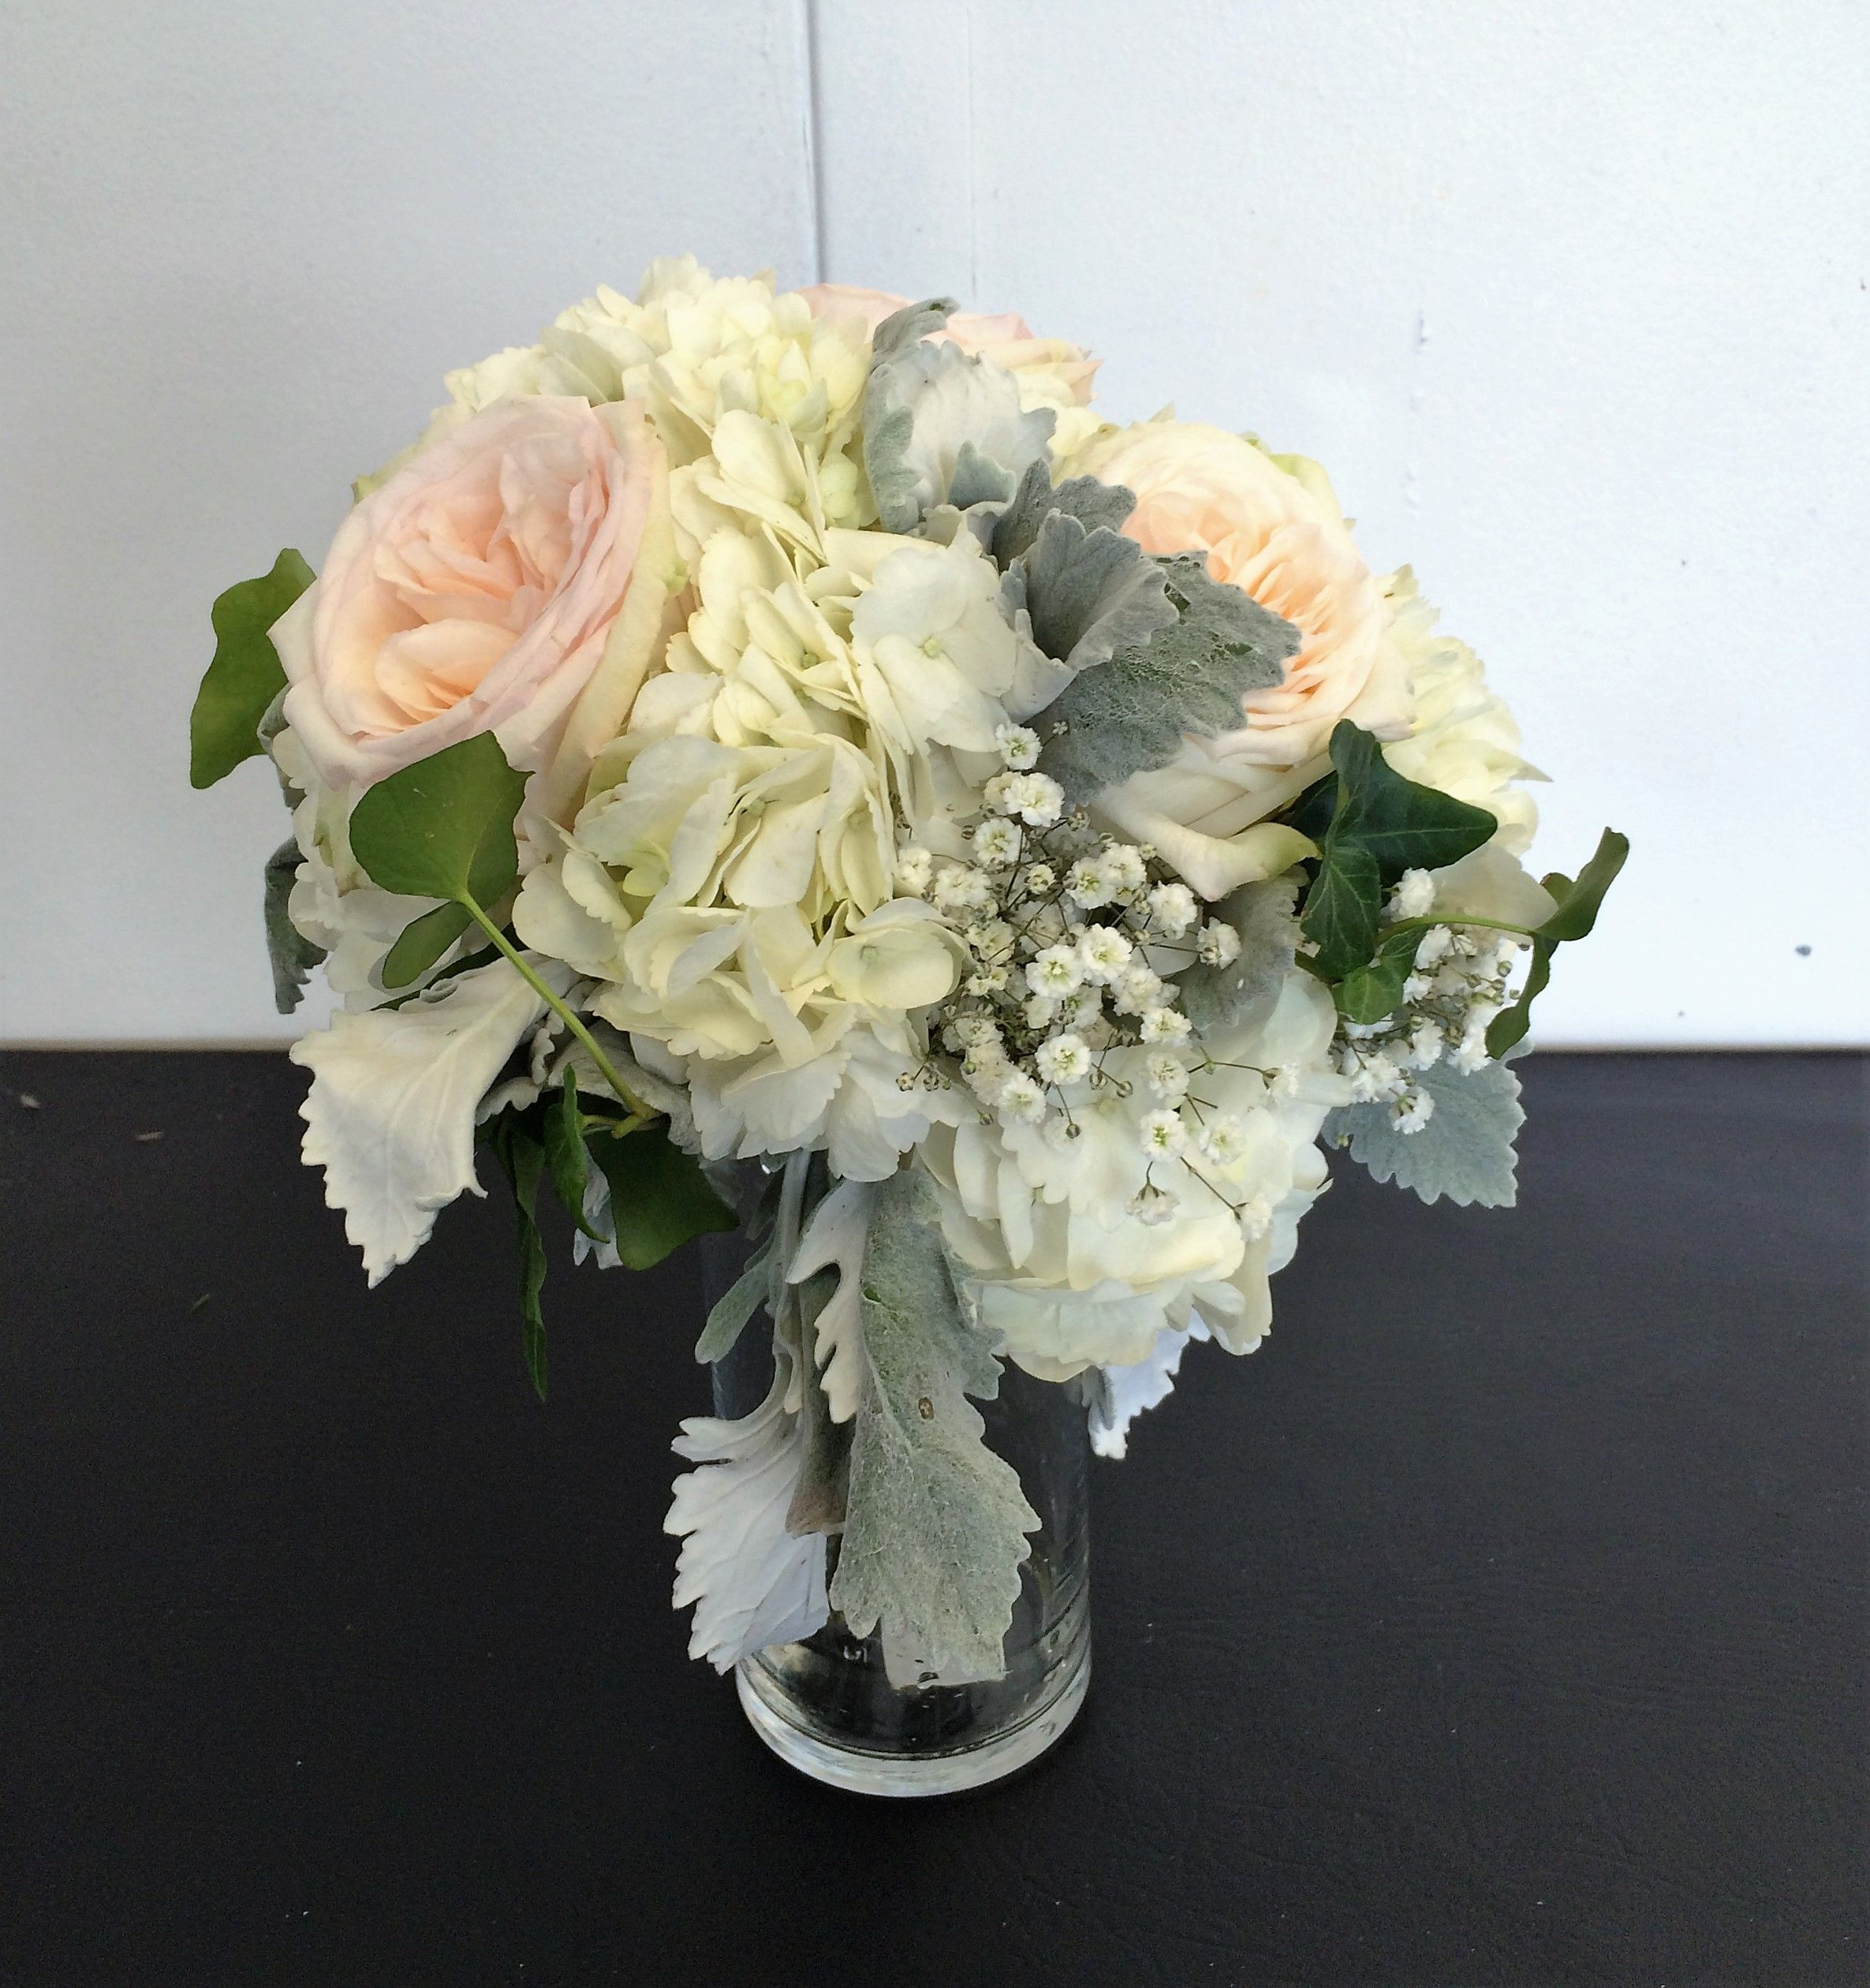 Merveilleux Bridal Bouquet. Blush Garden Roses. Hydrangea. Dusty Miller. Babies Breath.  White